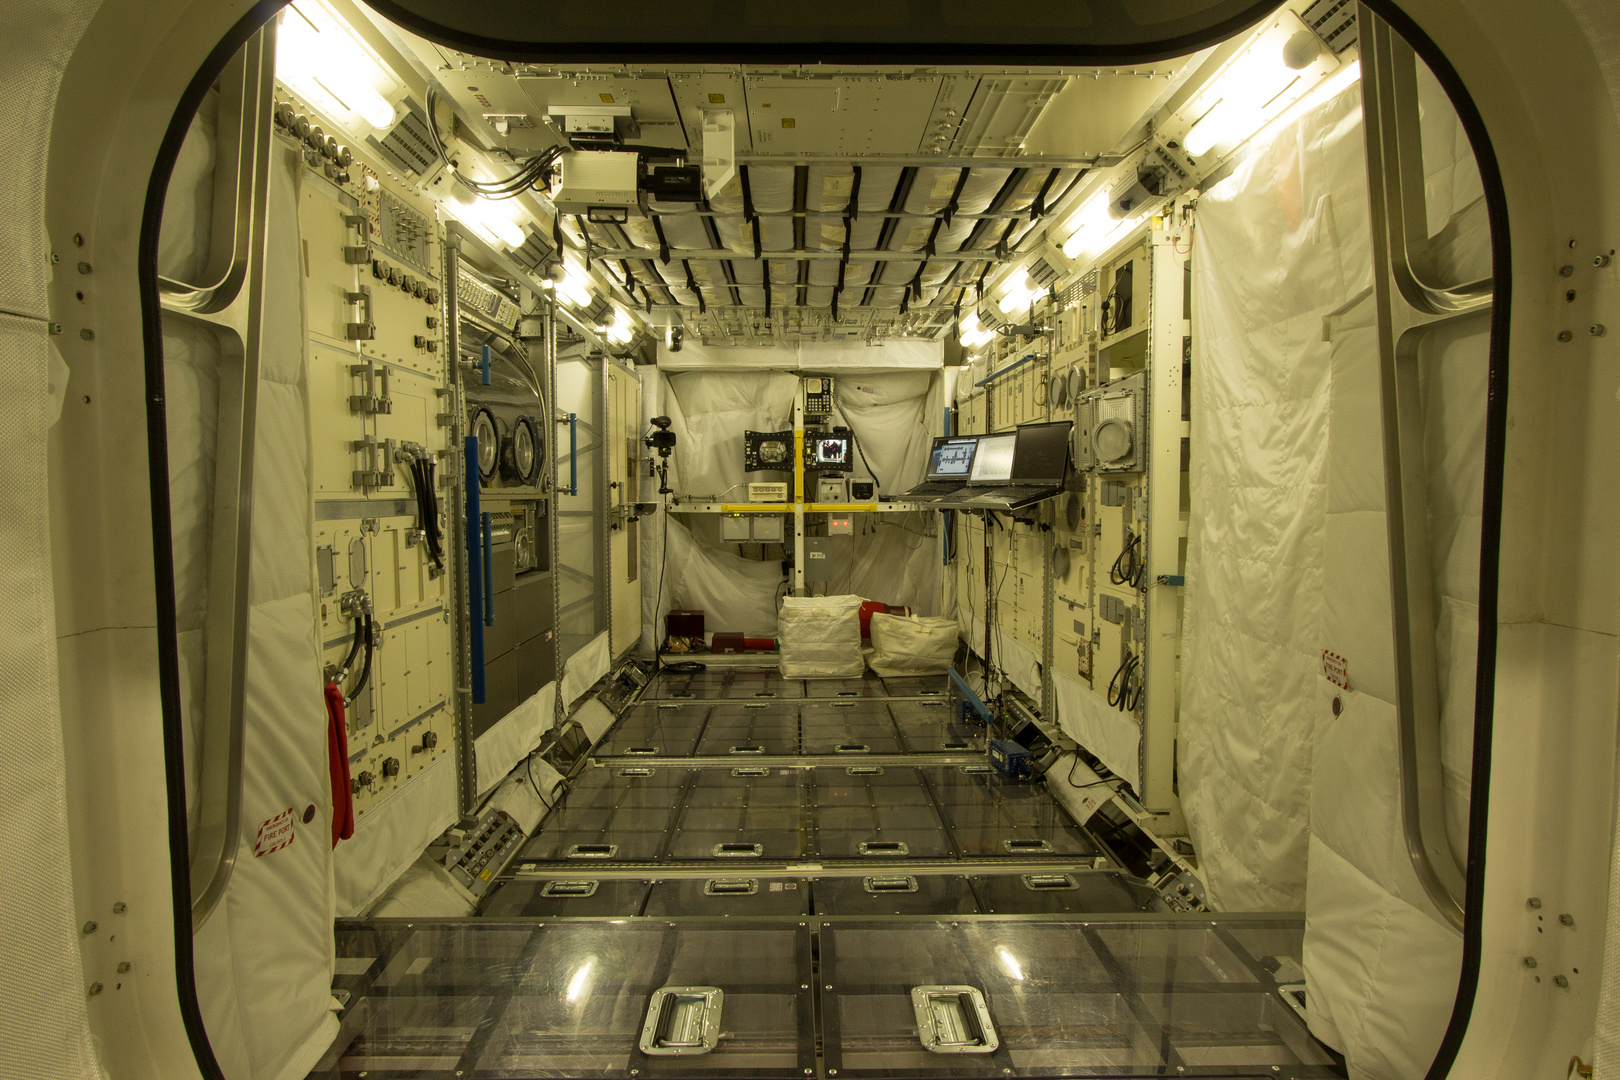 Columbus Mockup im Astronautenausbildungszentrum der ESA